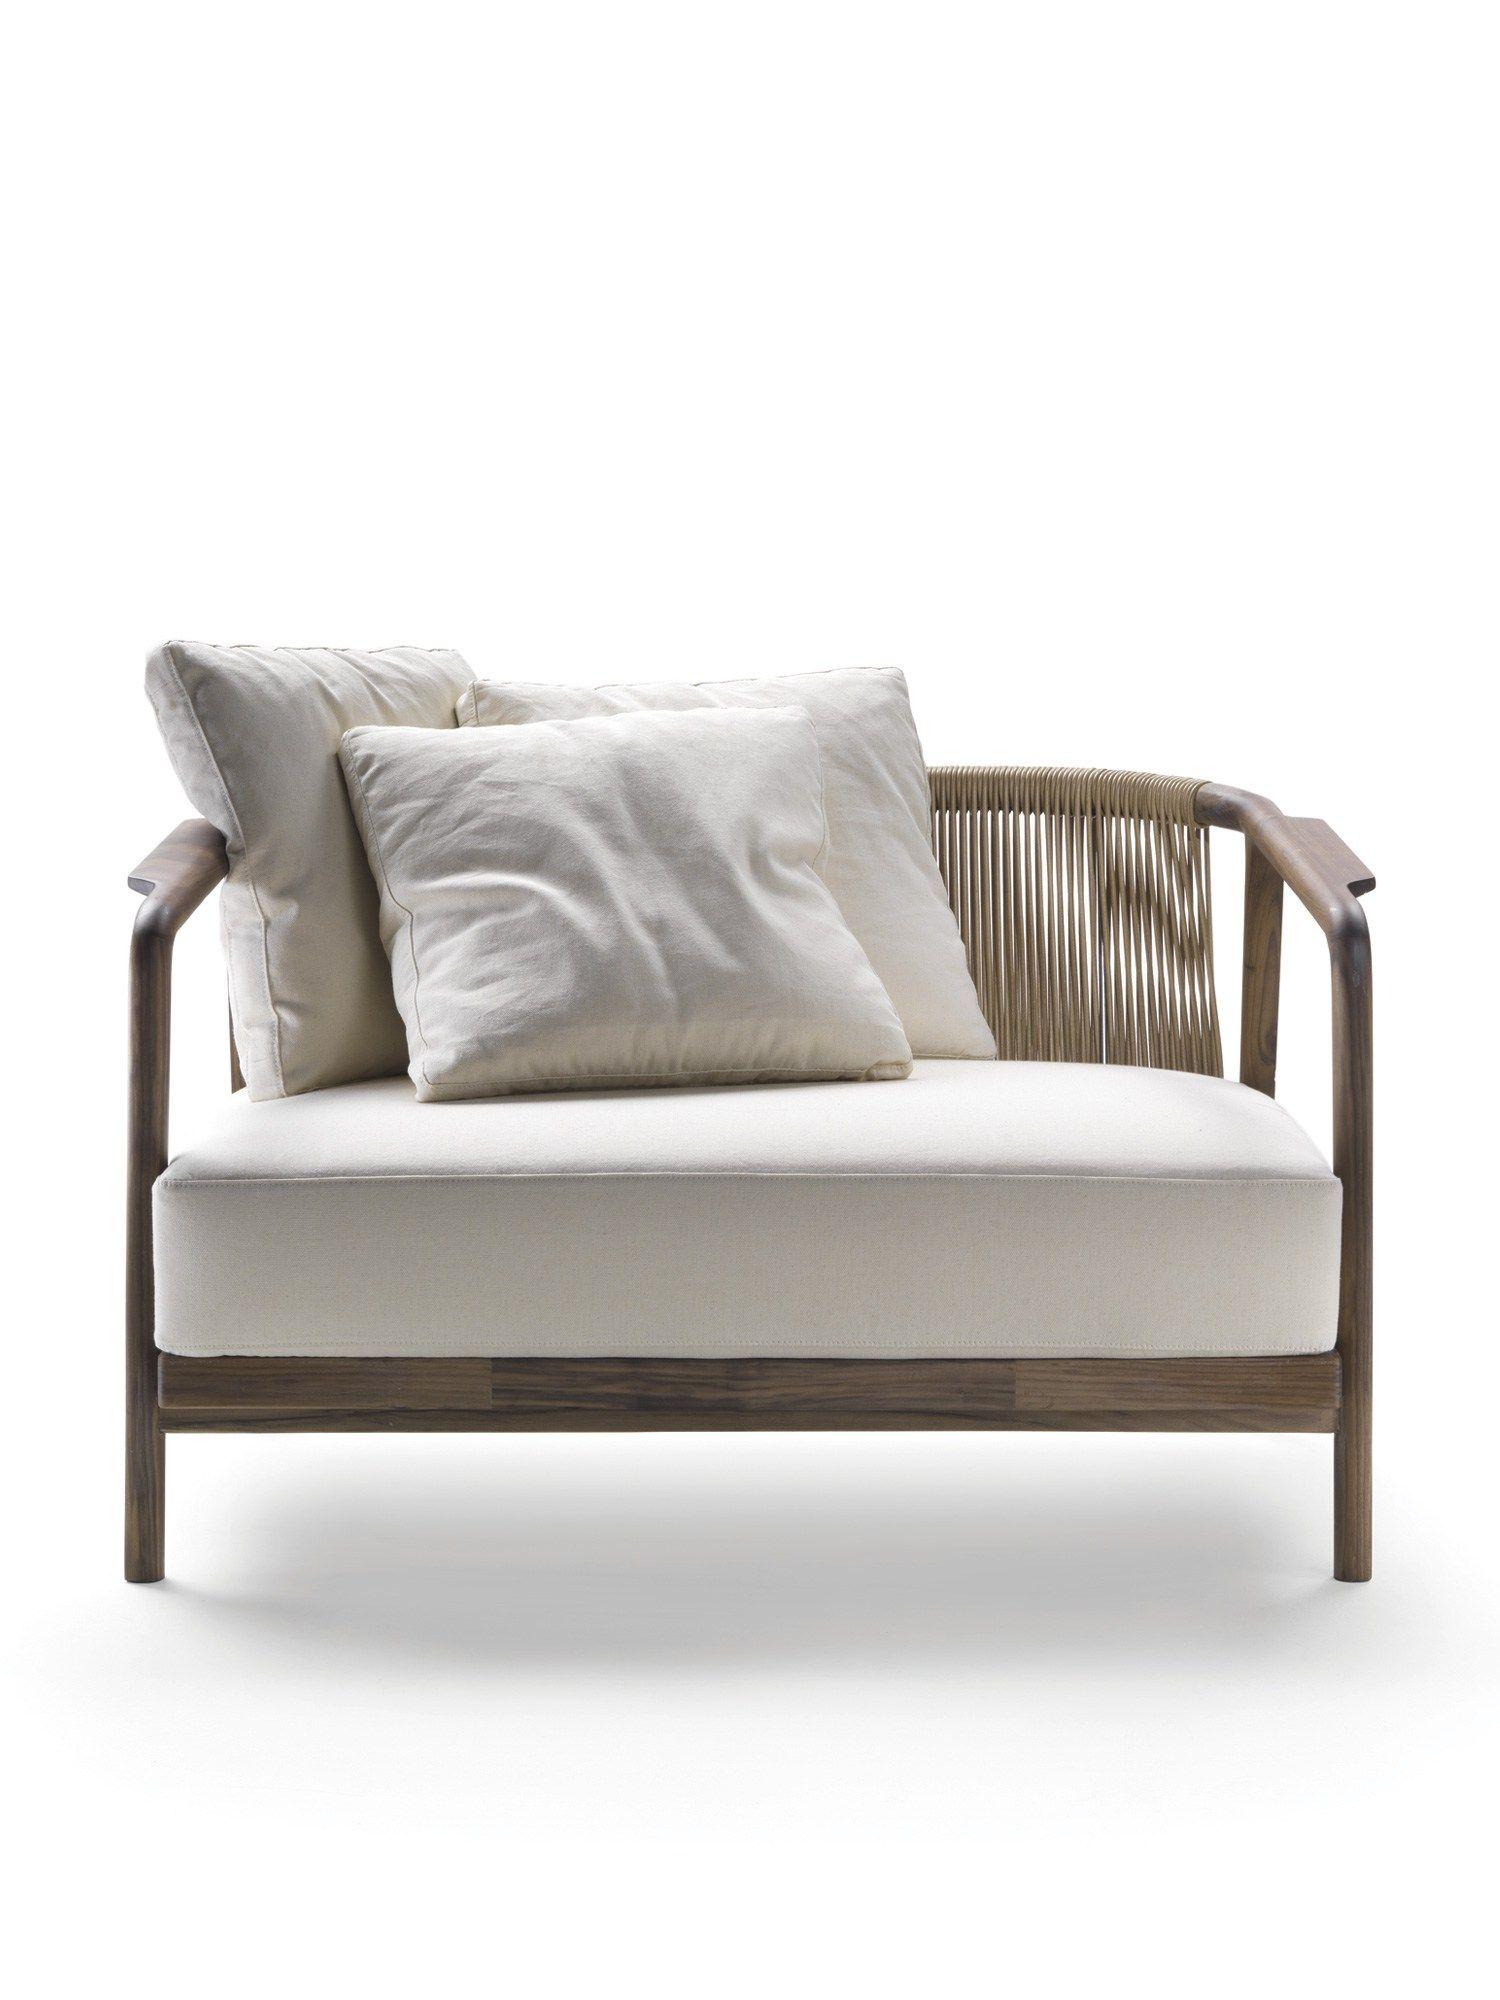 Best New Furniture At Salone Del Mobile Milano 2016